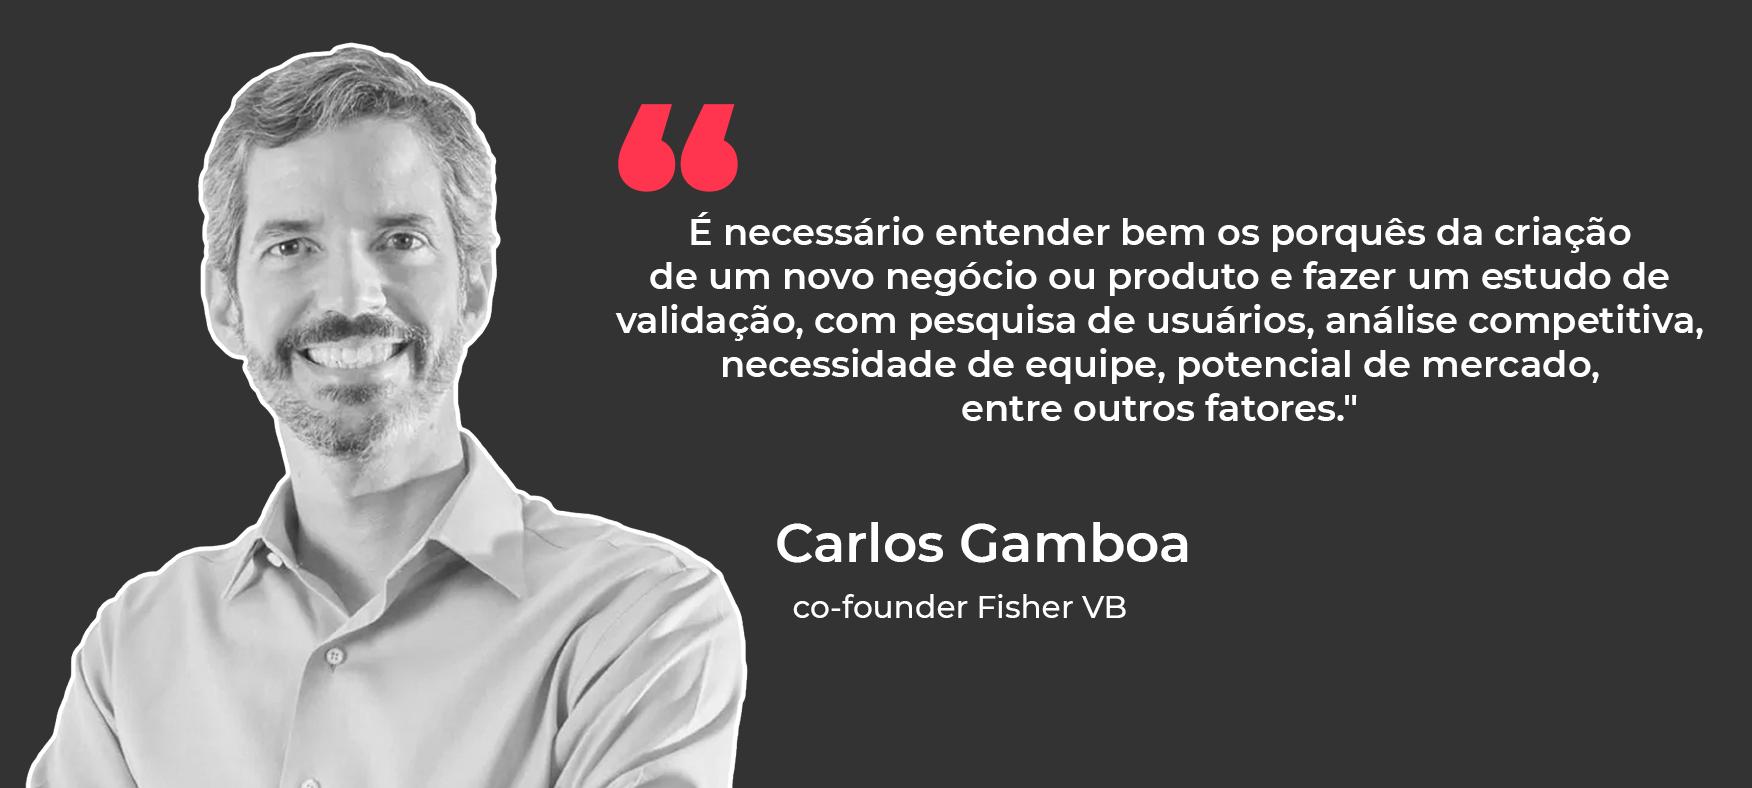 Carlos Gamboa, co-founder Fisher VB